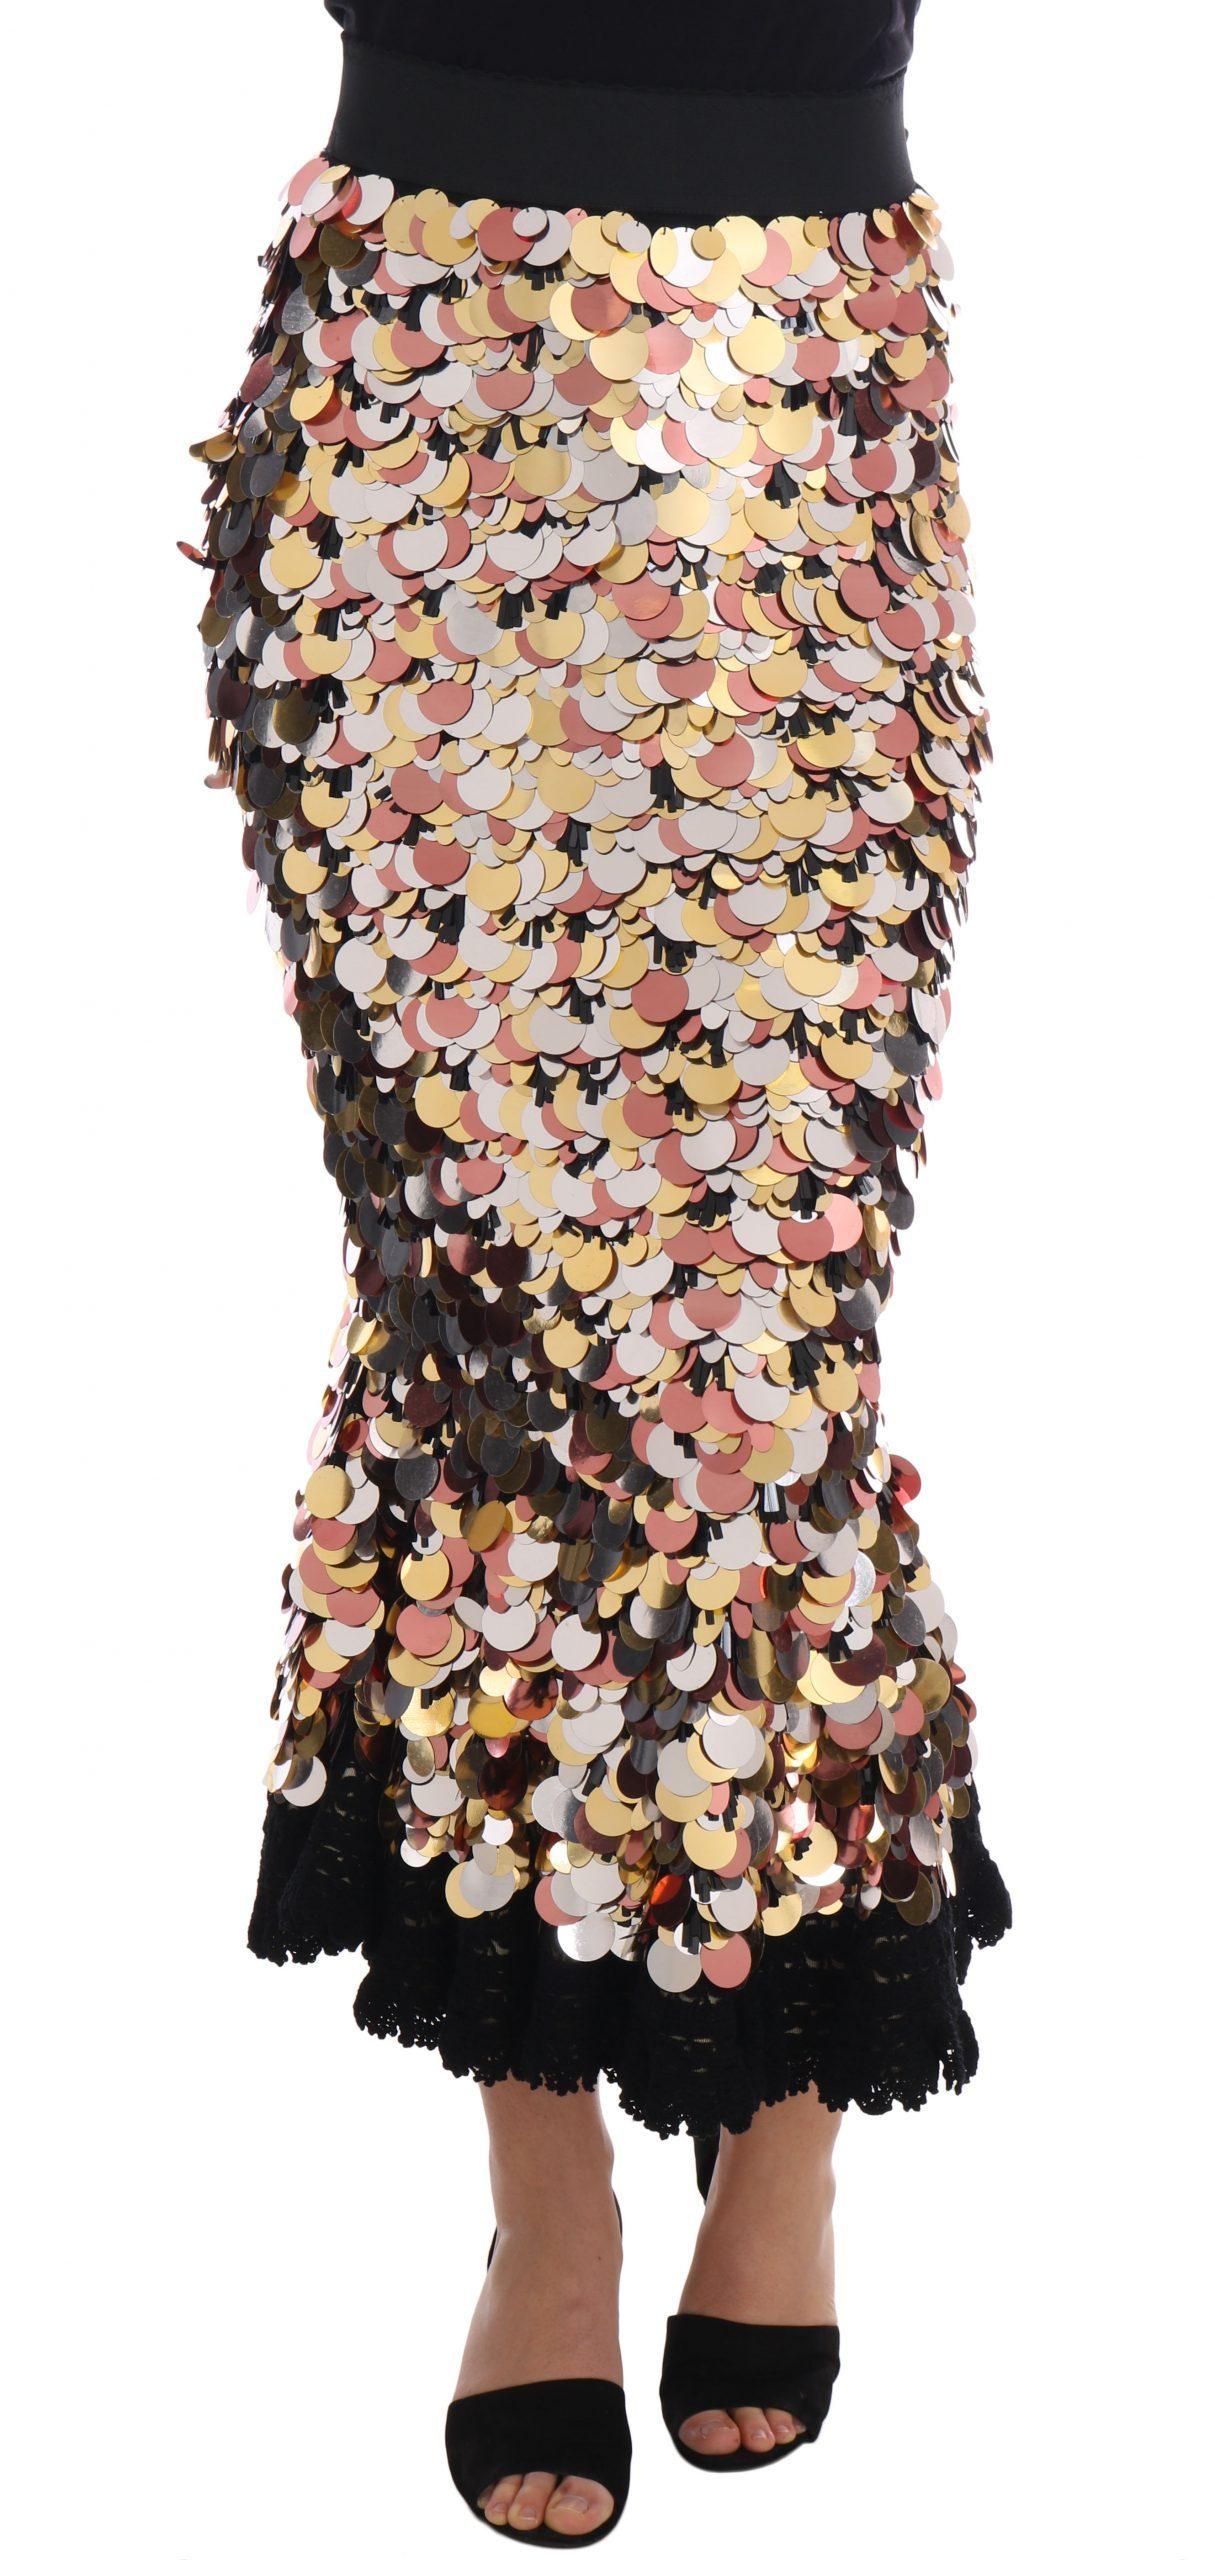 Dolce & Gabbana Women's Sequined Peplum High Waist Skirt Black SKI1130 - IT38|XS